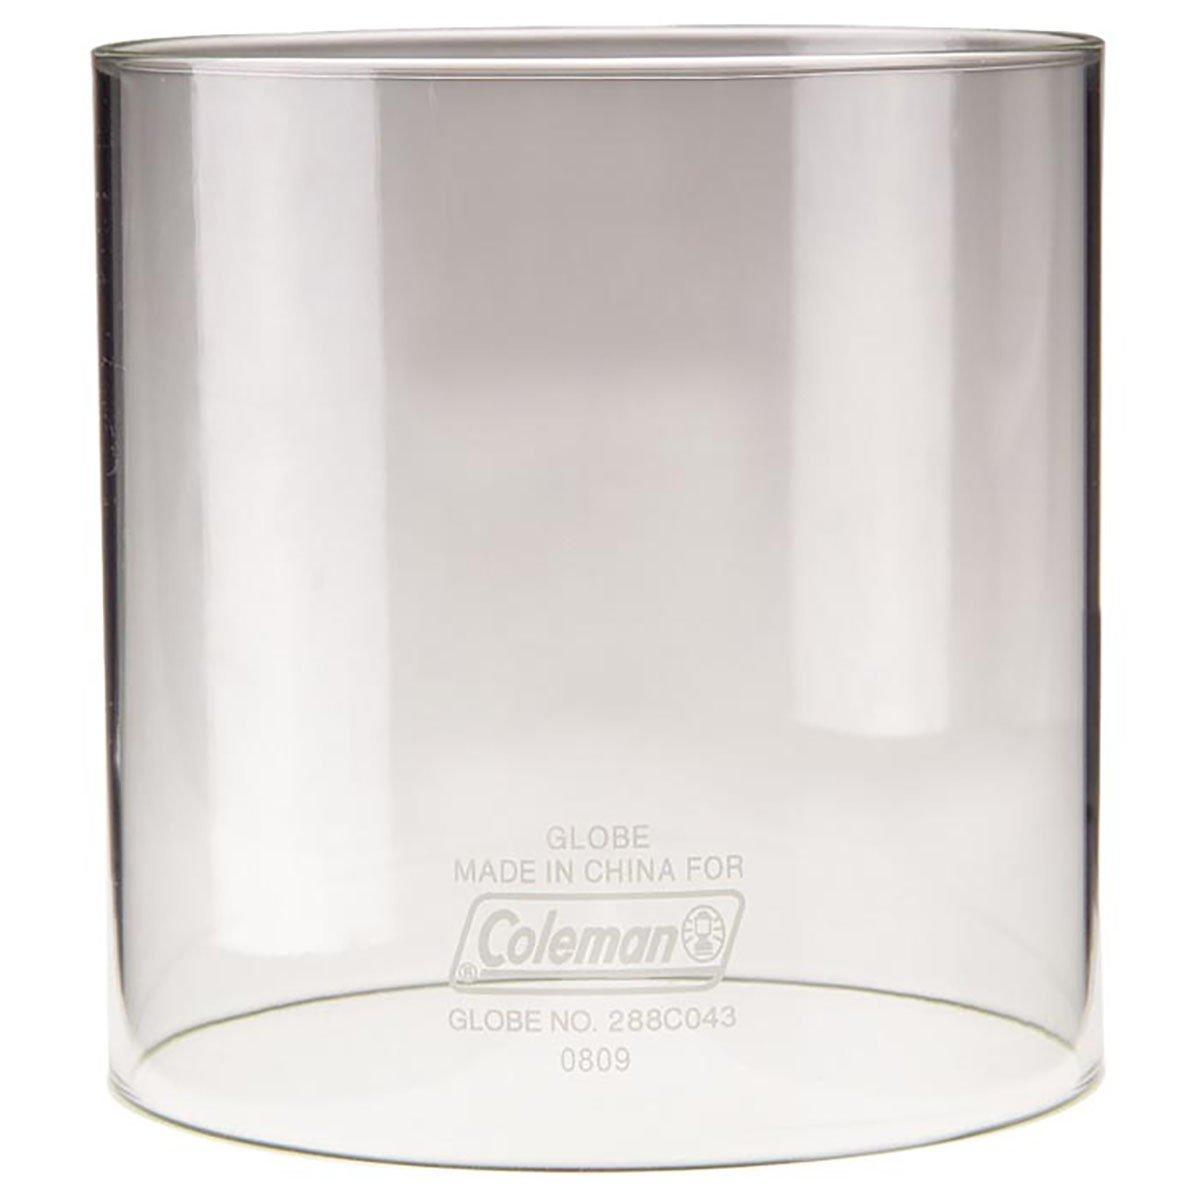 Set of 2 Coleman R214D046C Lantern Globe bundled by Maven Gifts